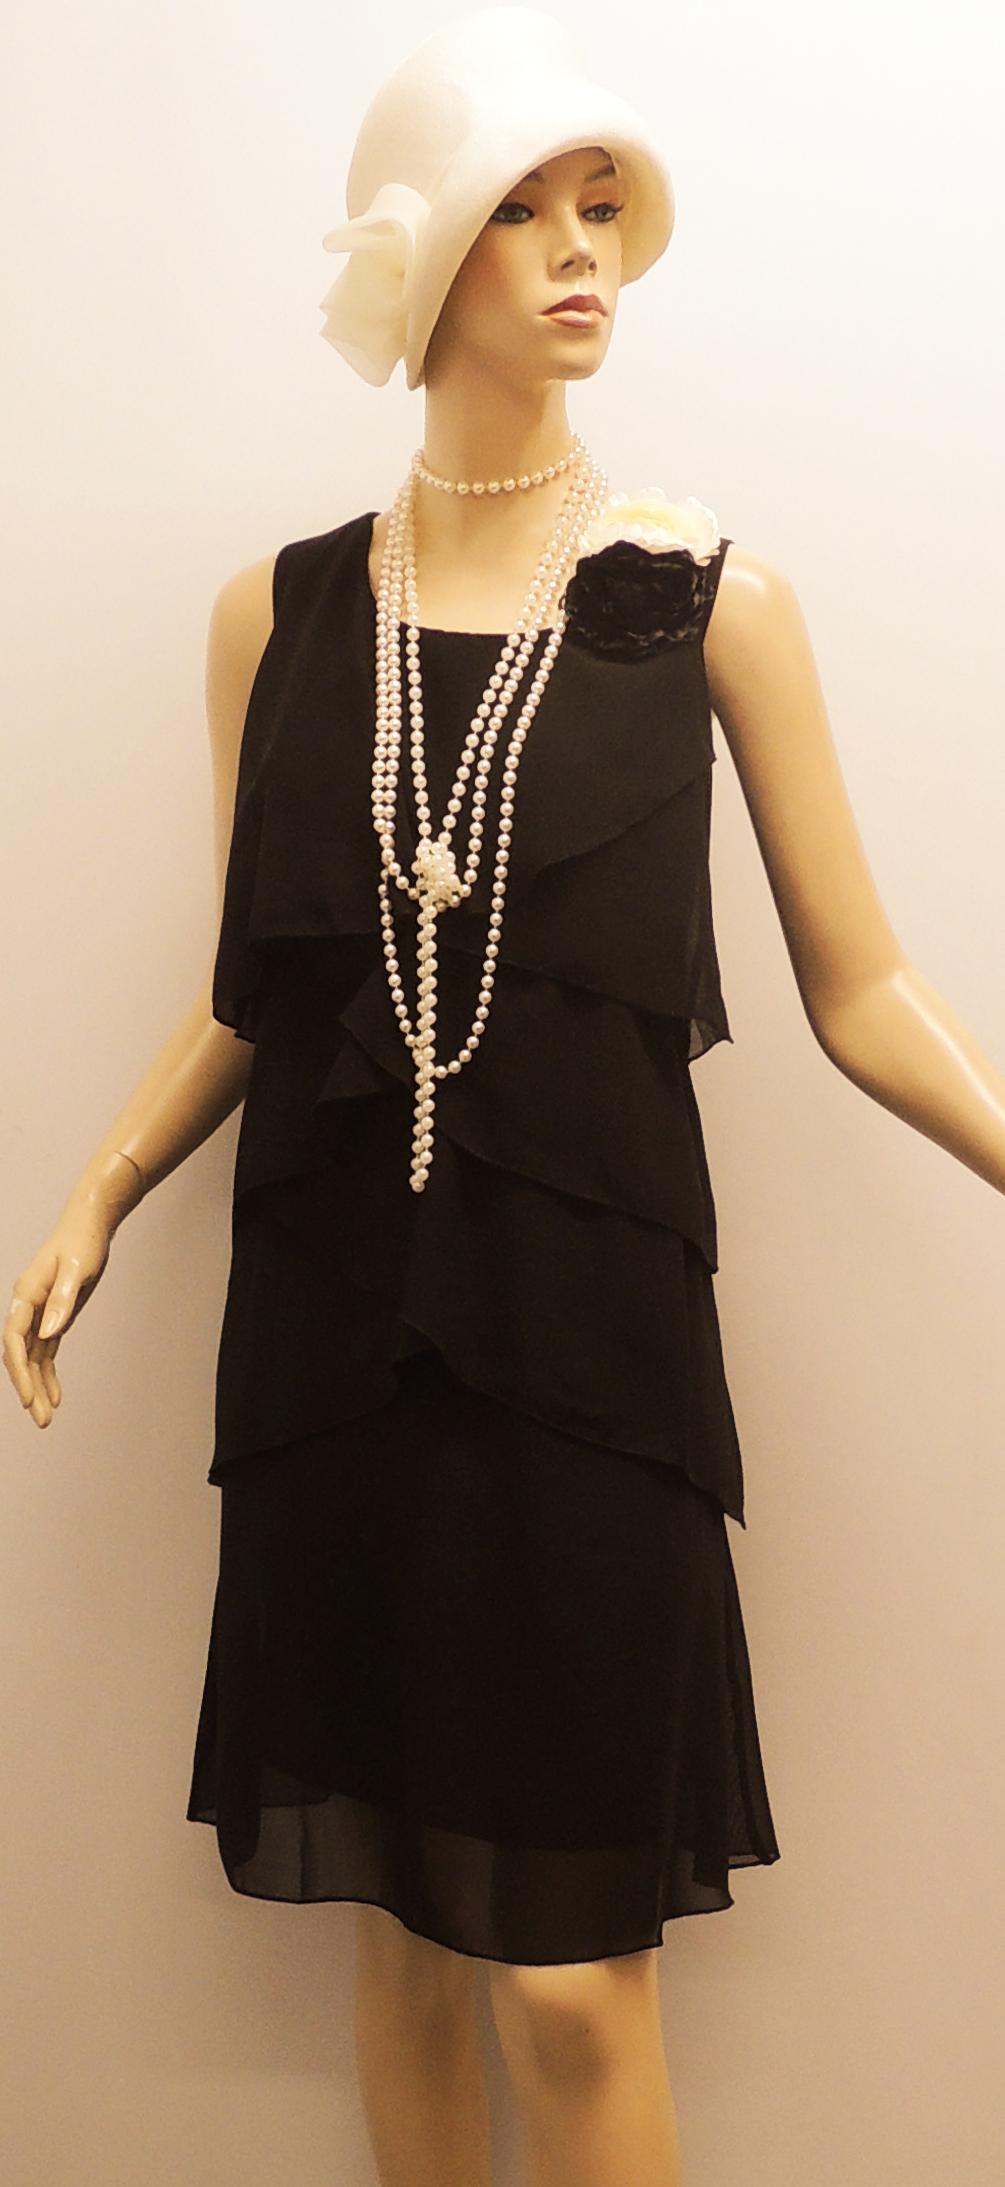 Vintage Ann Es 1920 Noir Gatsby Deco Downton Abbey Charleston Mousseline De Soie Ebay